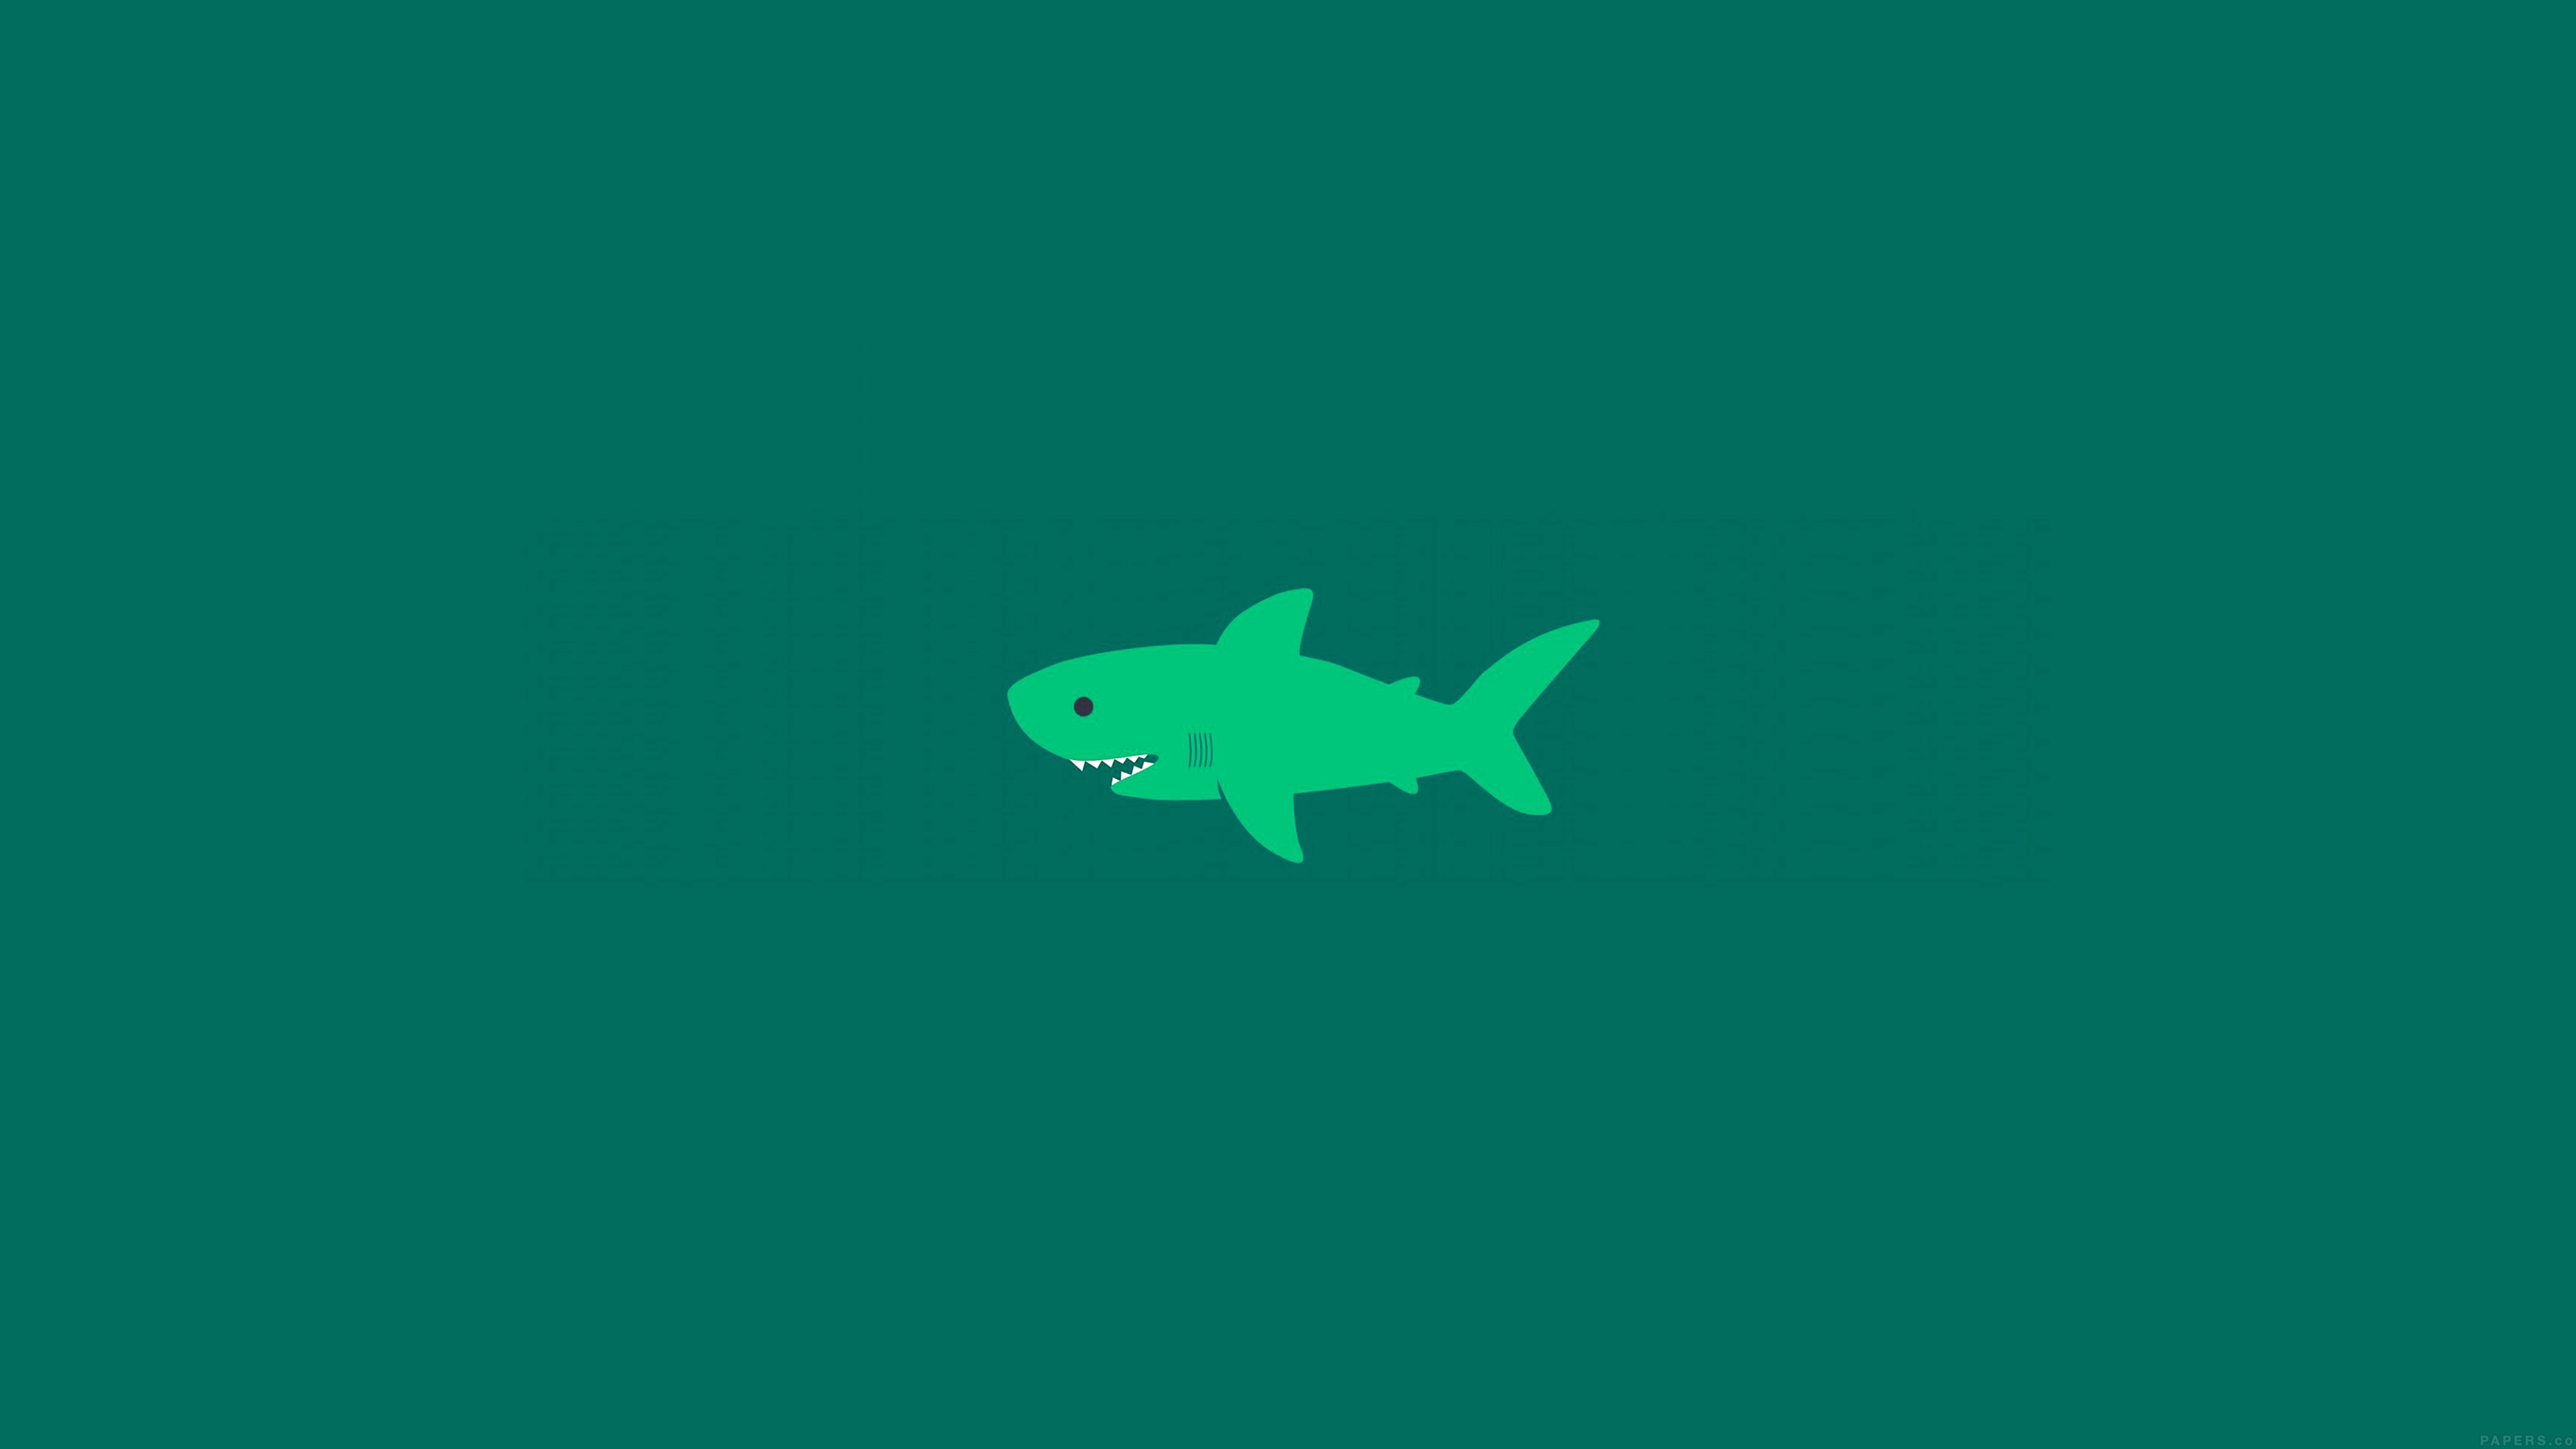 Cute Wallpapers Green Mint I Love Papers Wallpaper Ak02 Little Small Cute Shark